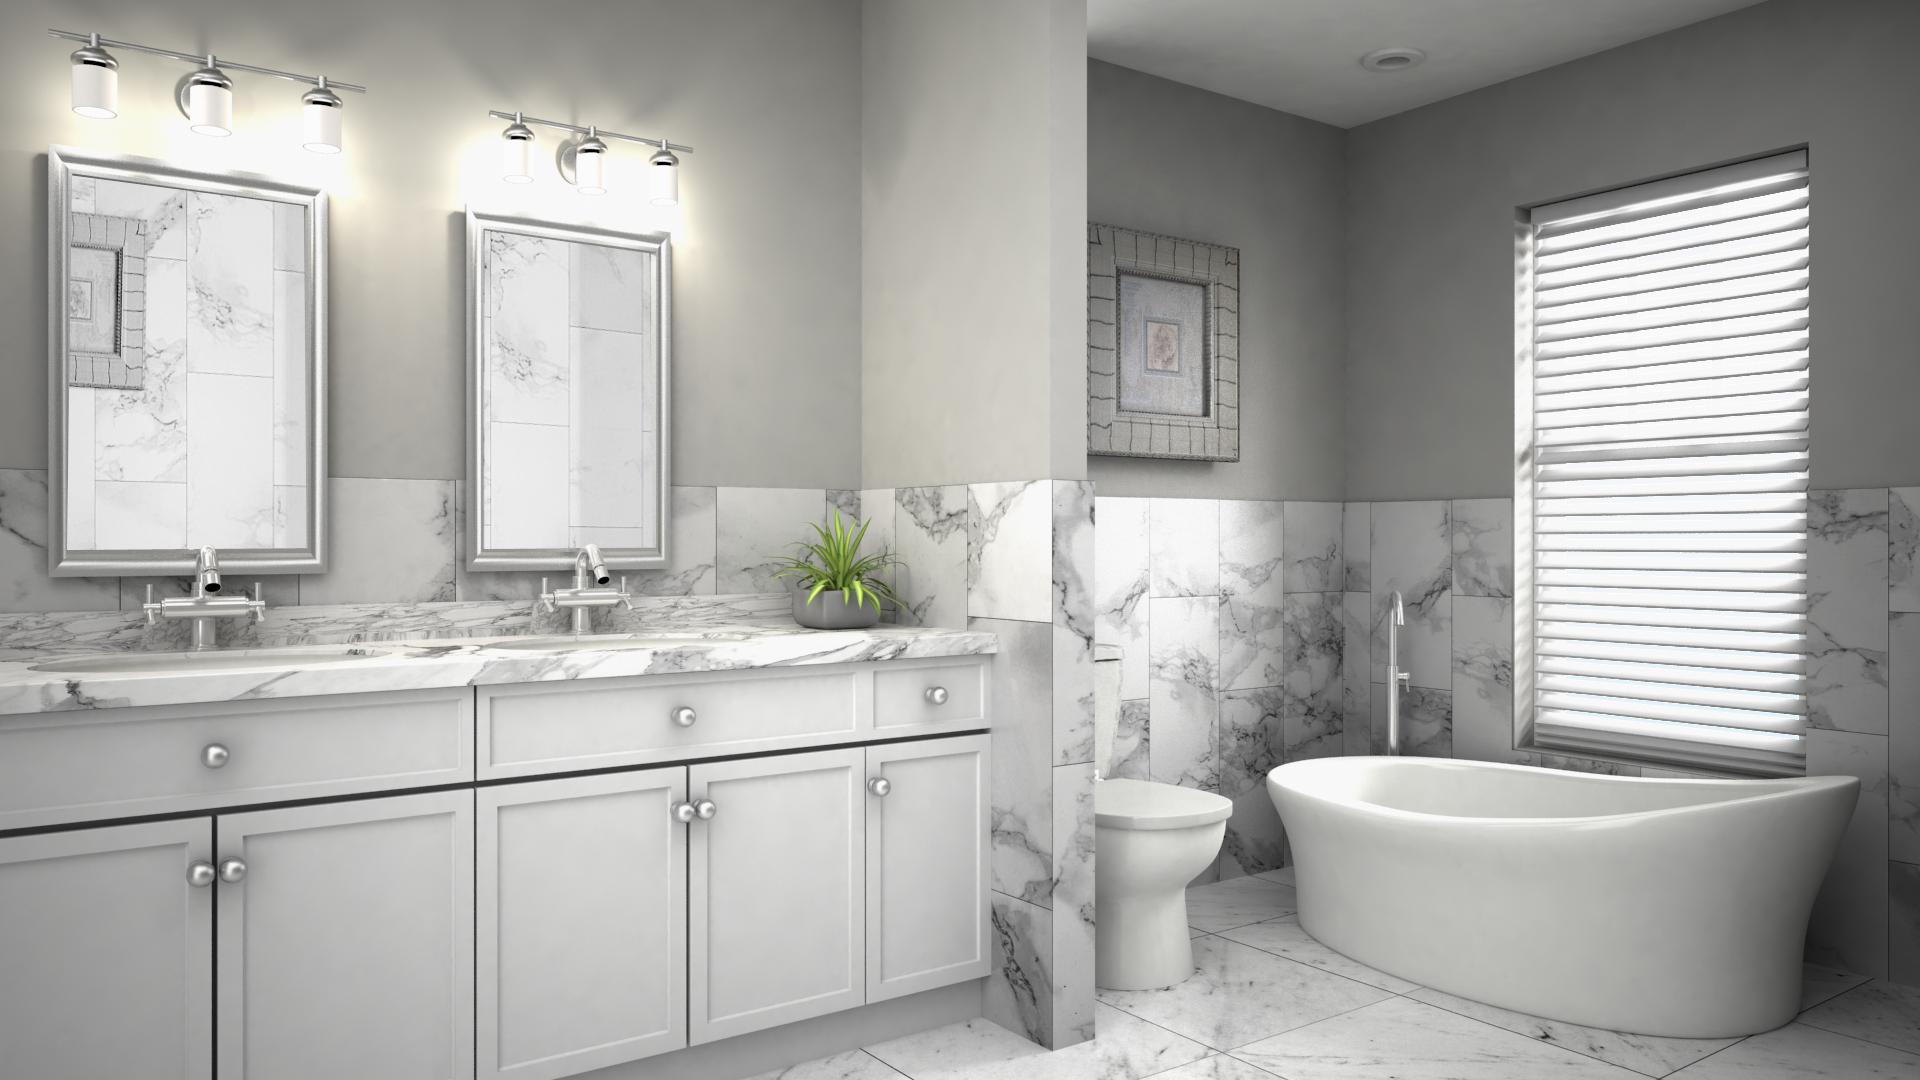 138 W Maple Street – Master Bathroom I